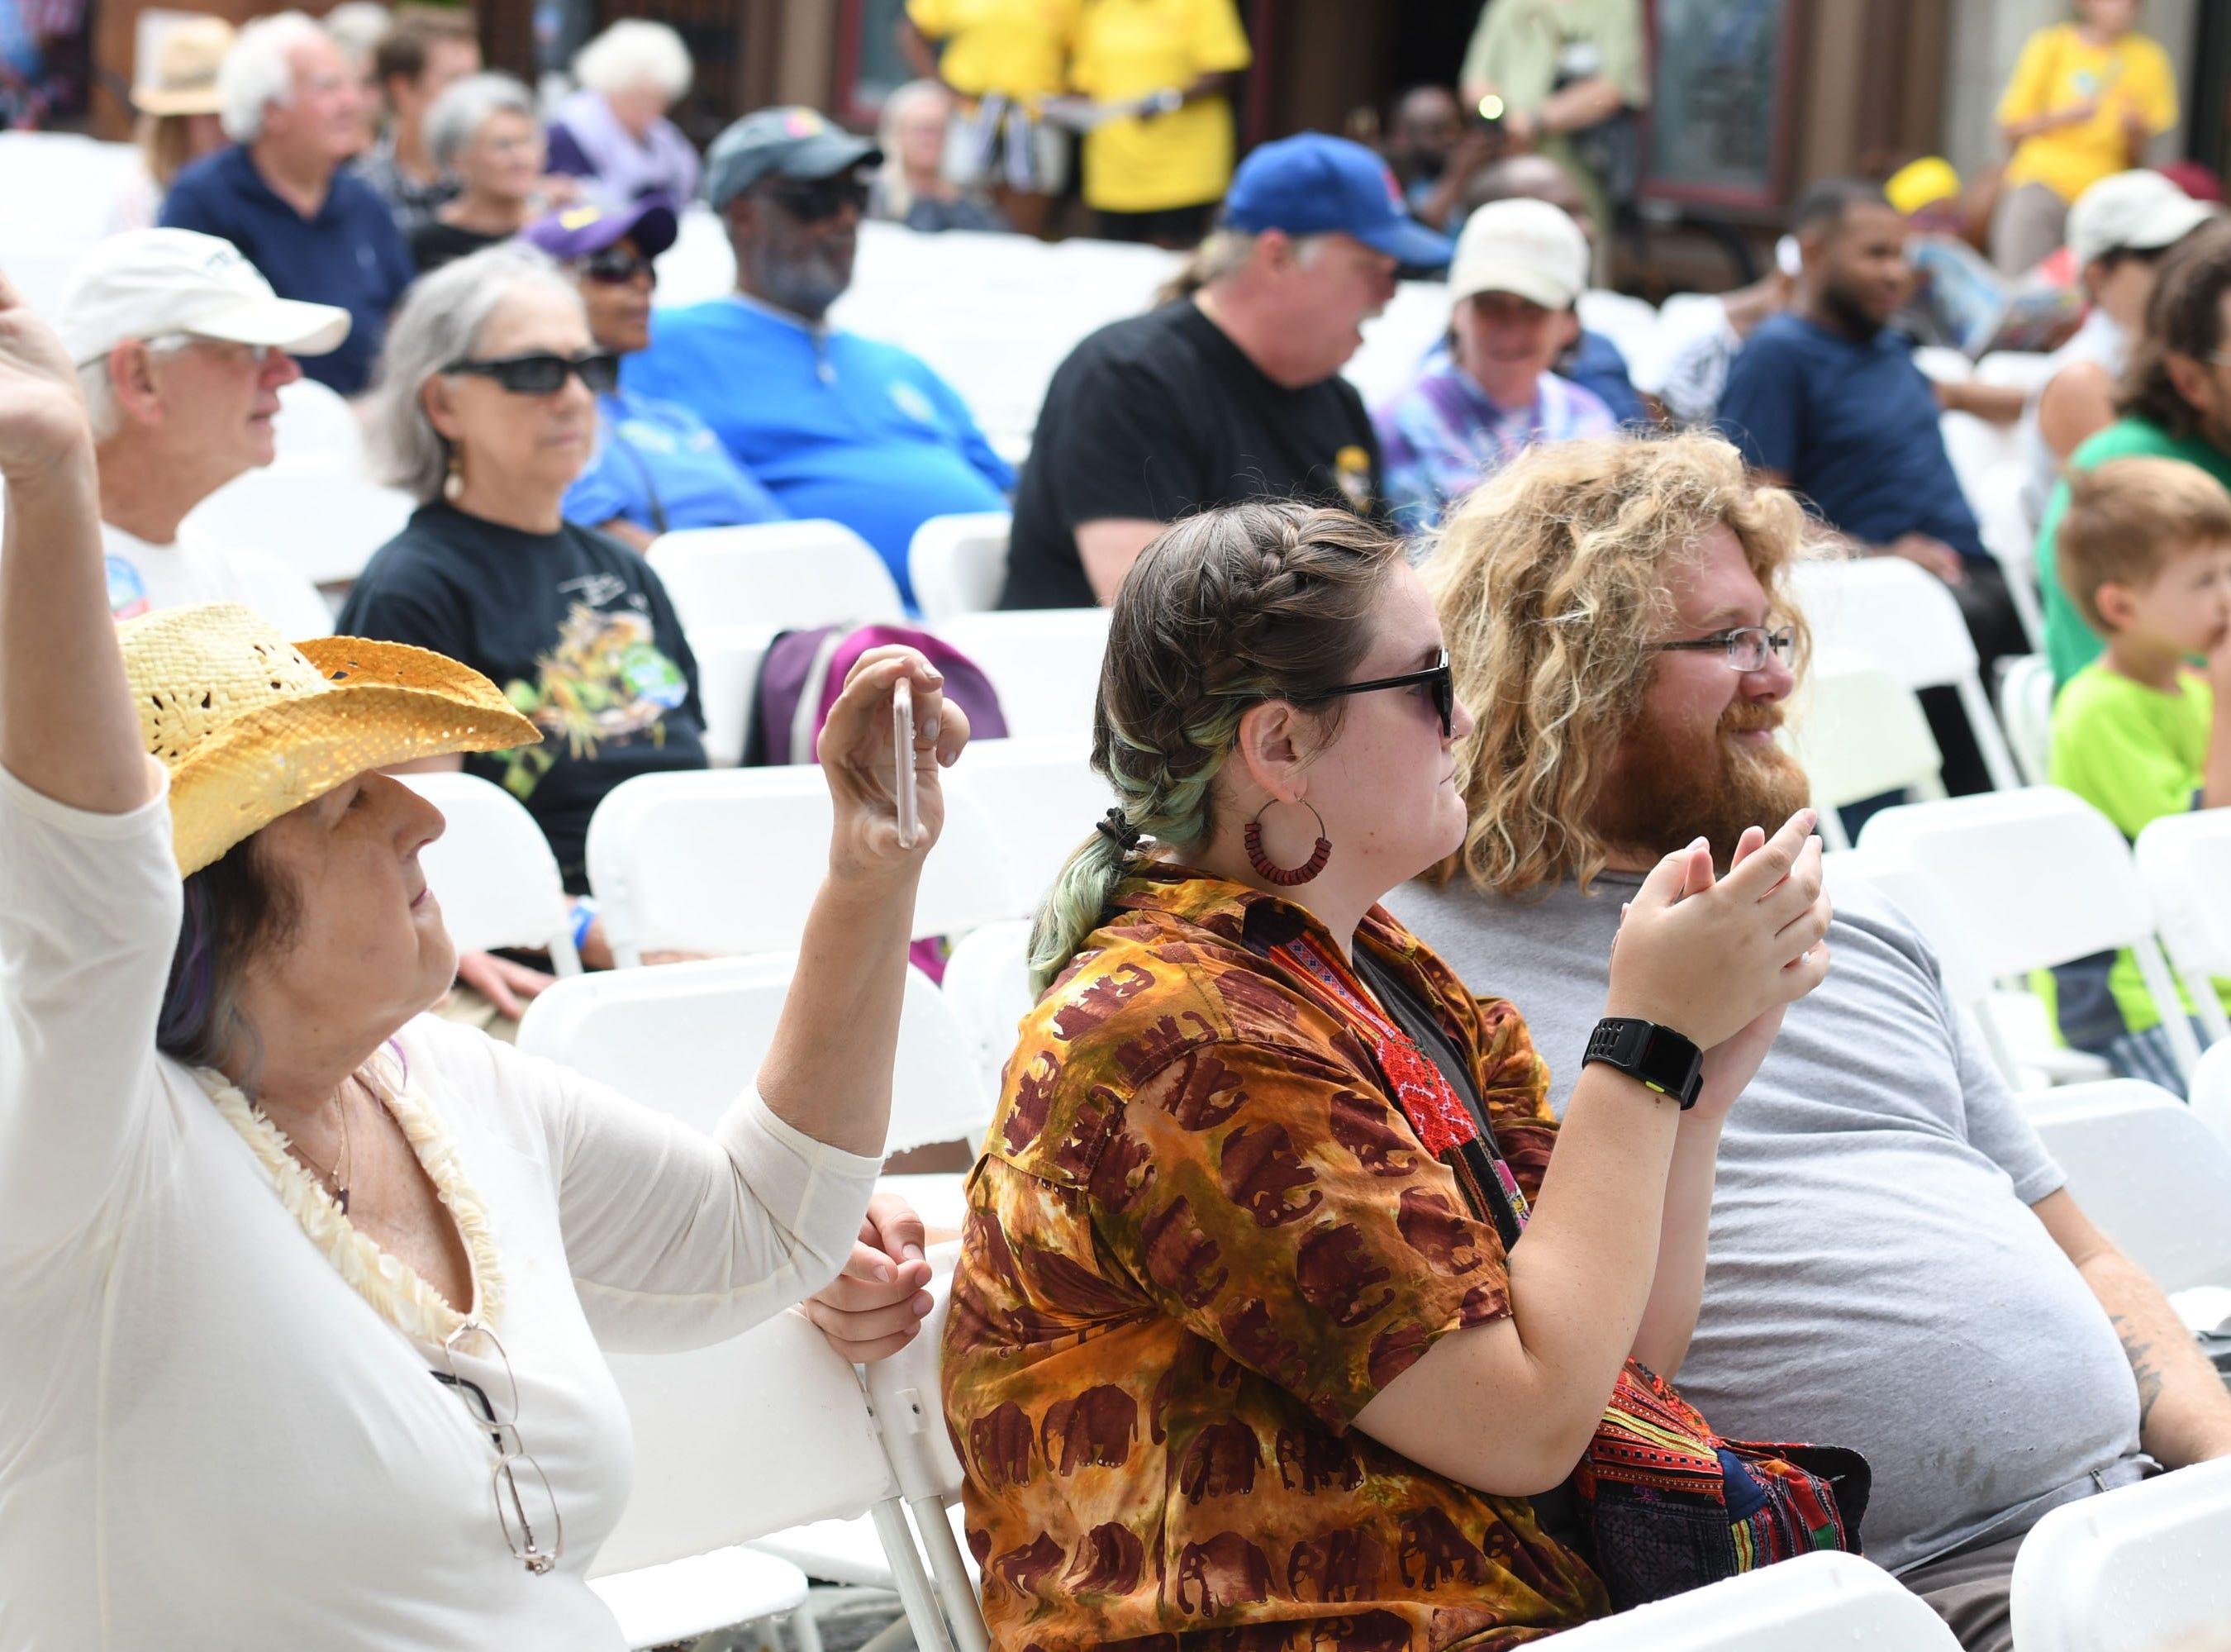 National Folk Festival attendees listen to Make a Joyful Noise: Gospel Masters on Saturday, Sept. 8, 2018 in Salisbury, Md.